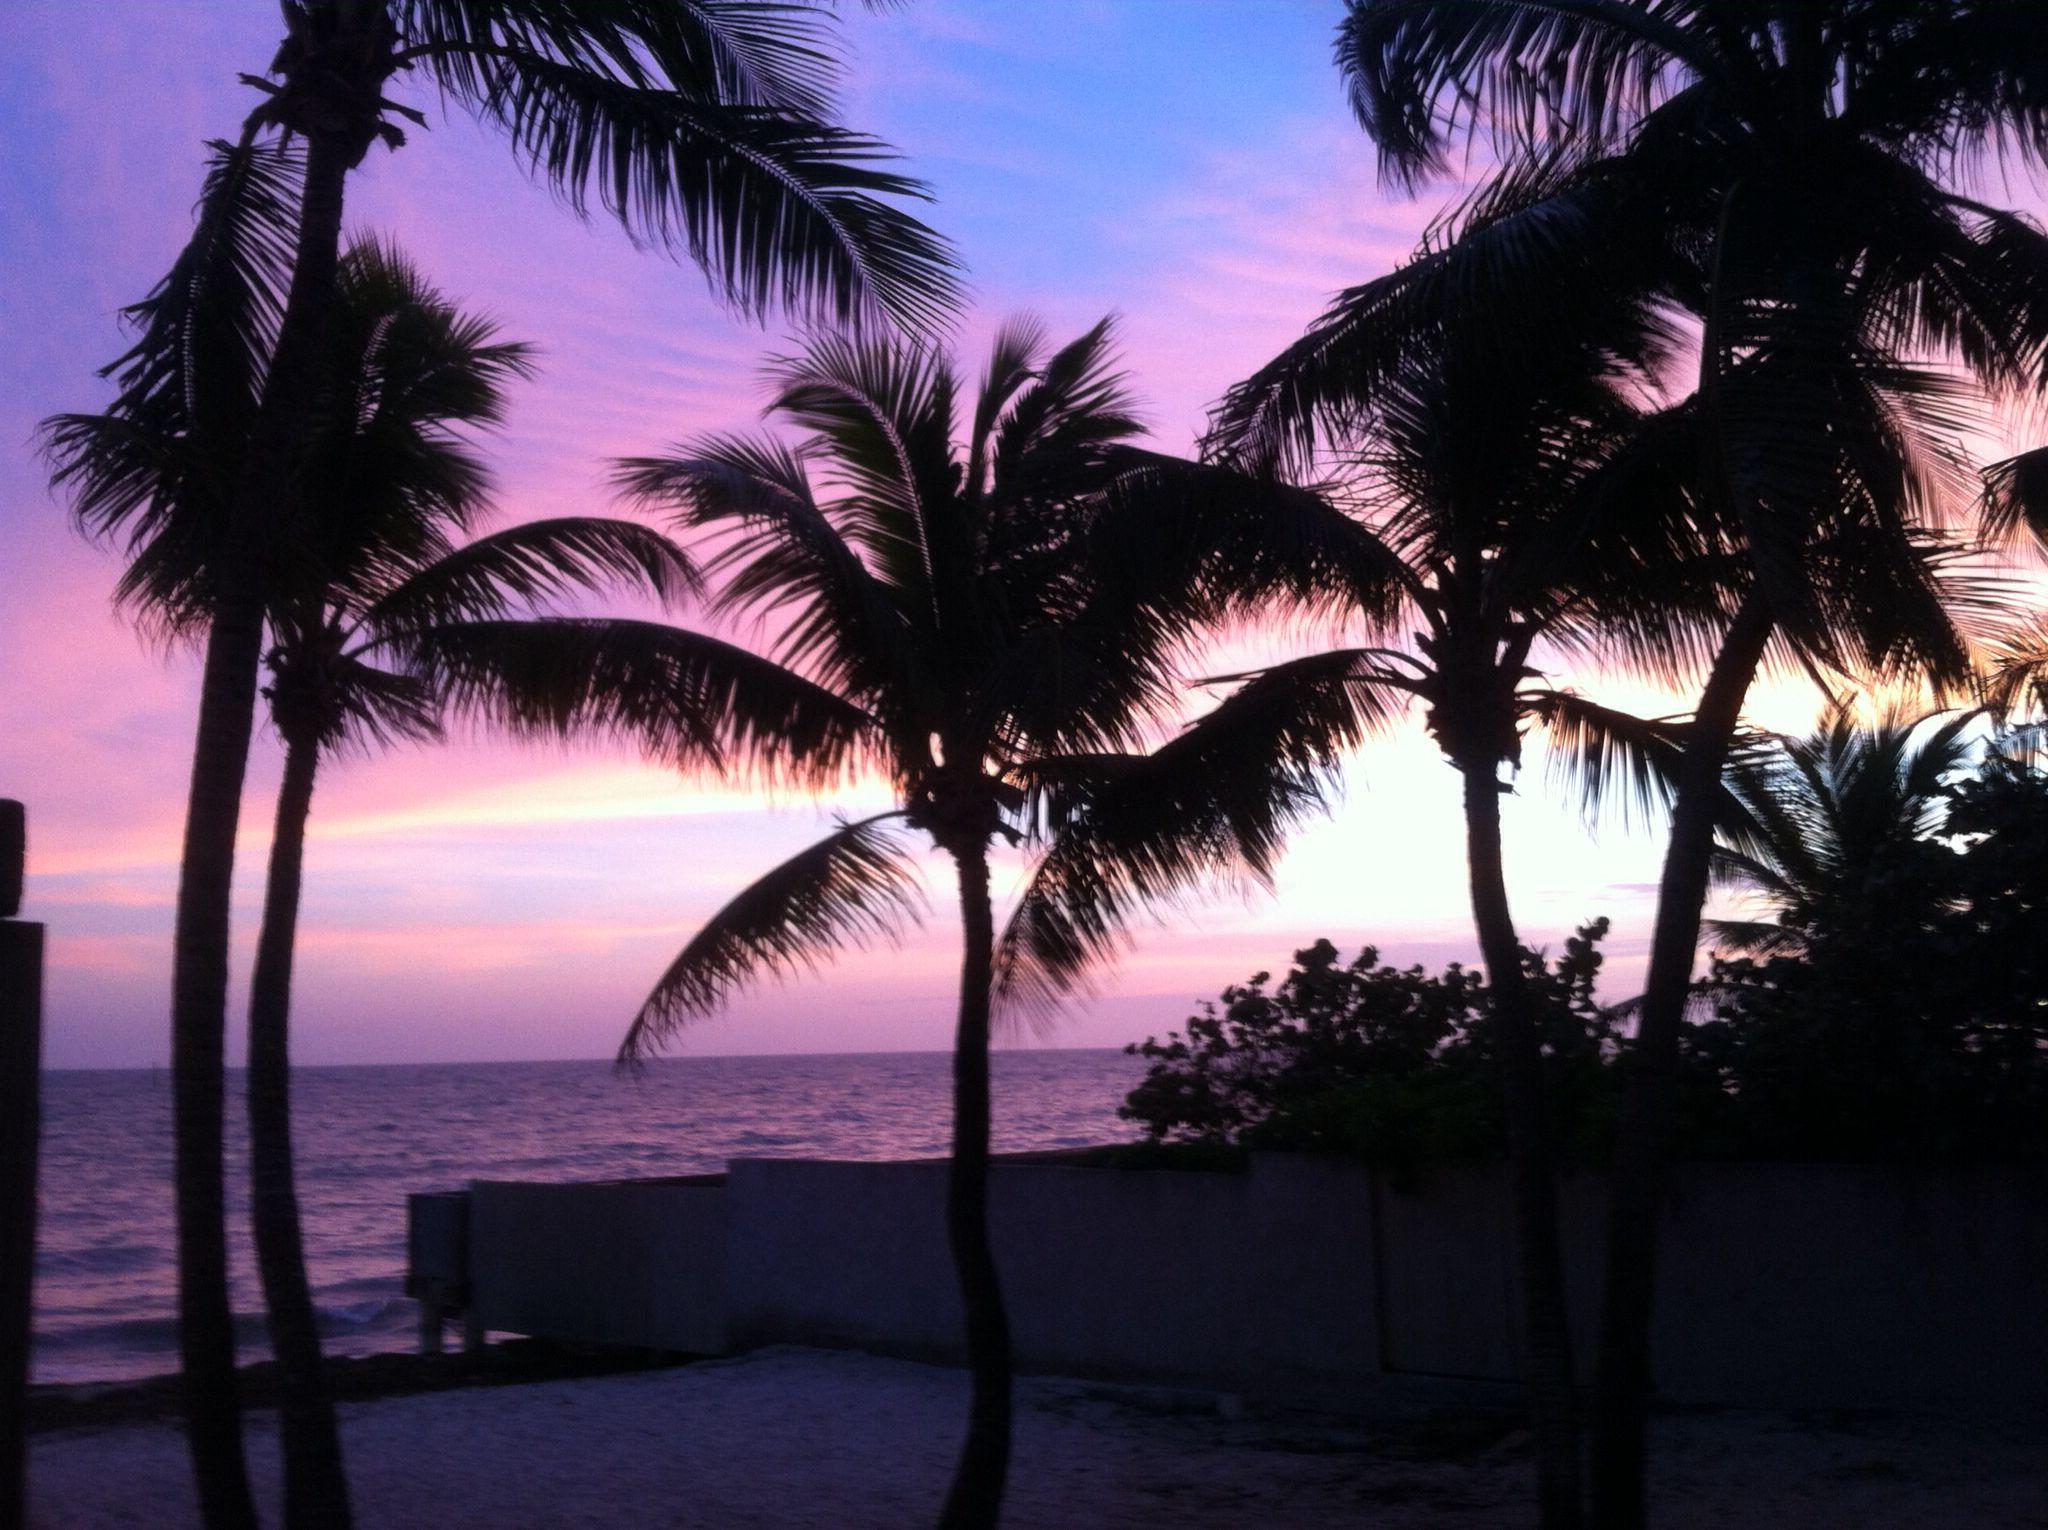 Key West - one last shot of the beautiful key west.